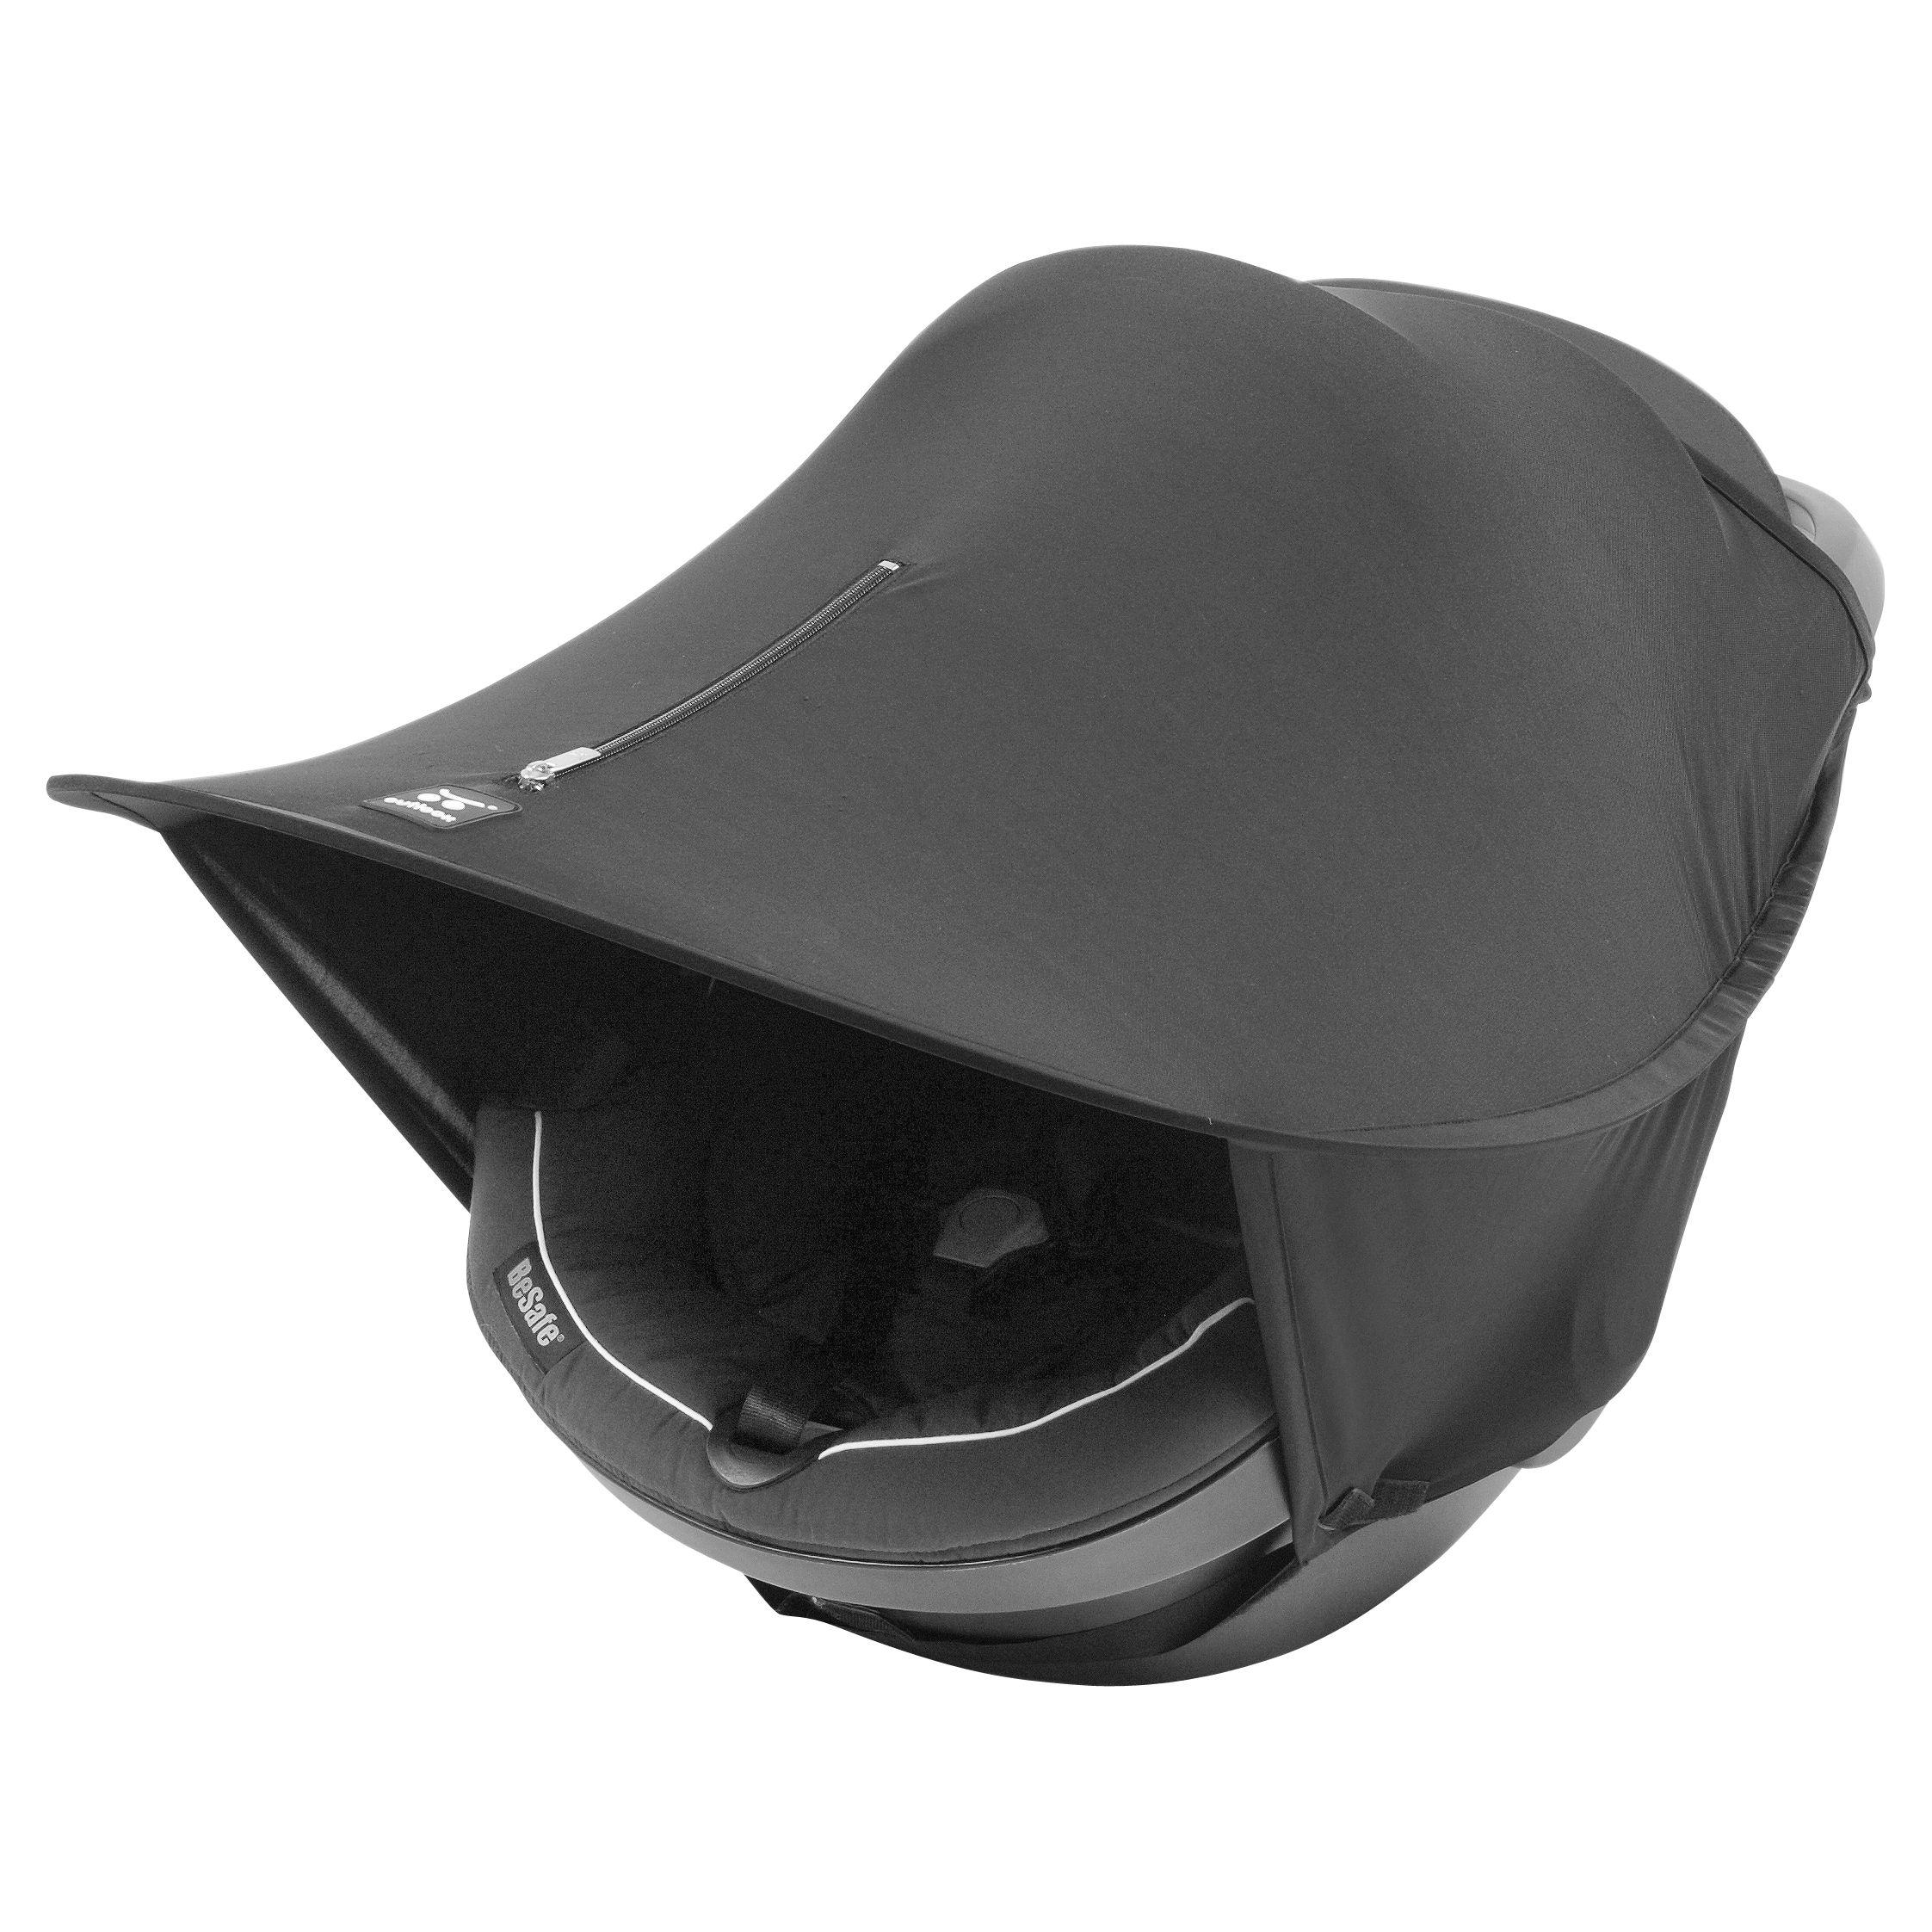 Outlook Outlook Universal Pushchair/Infant Carrier Solar Shade, Black